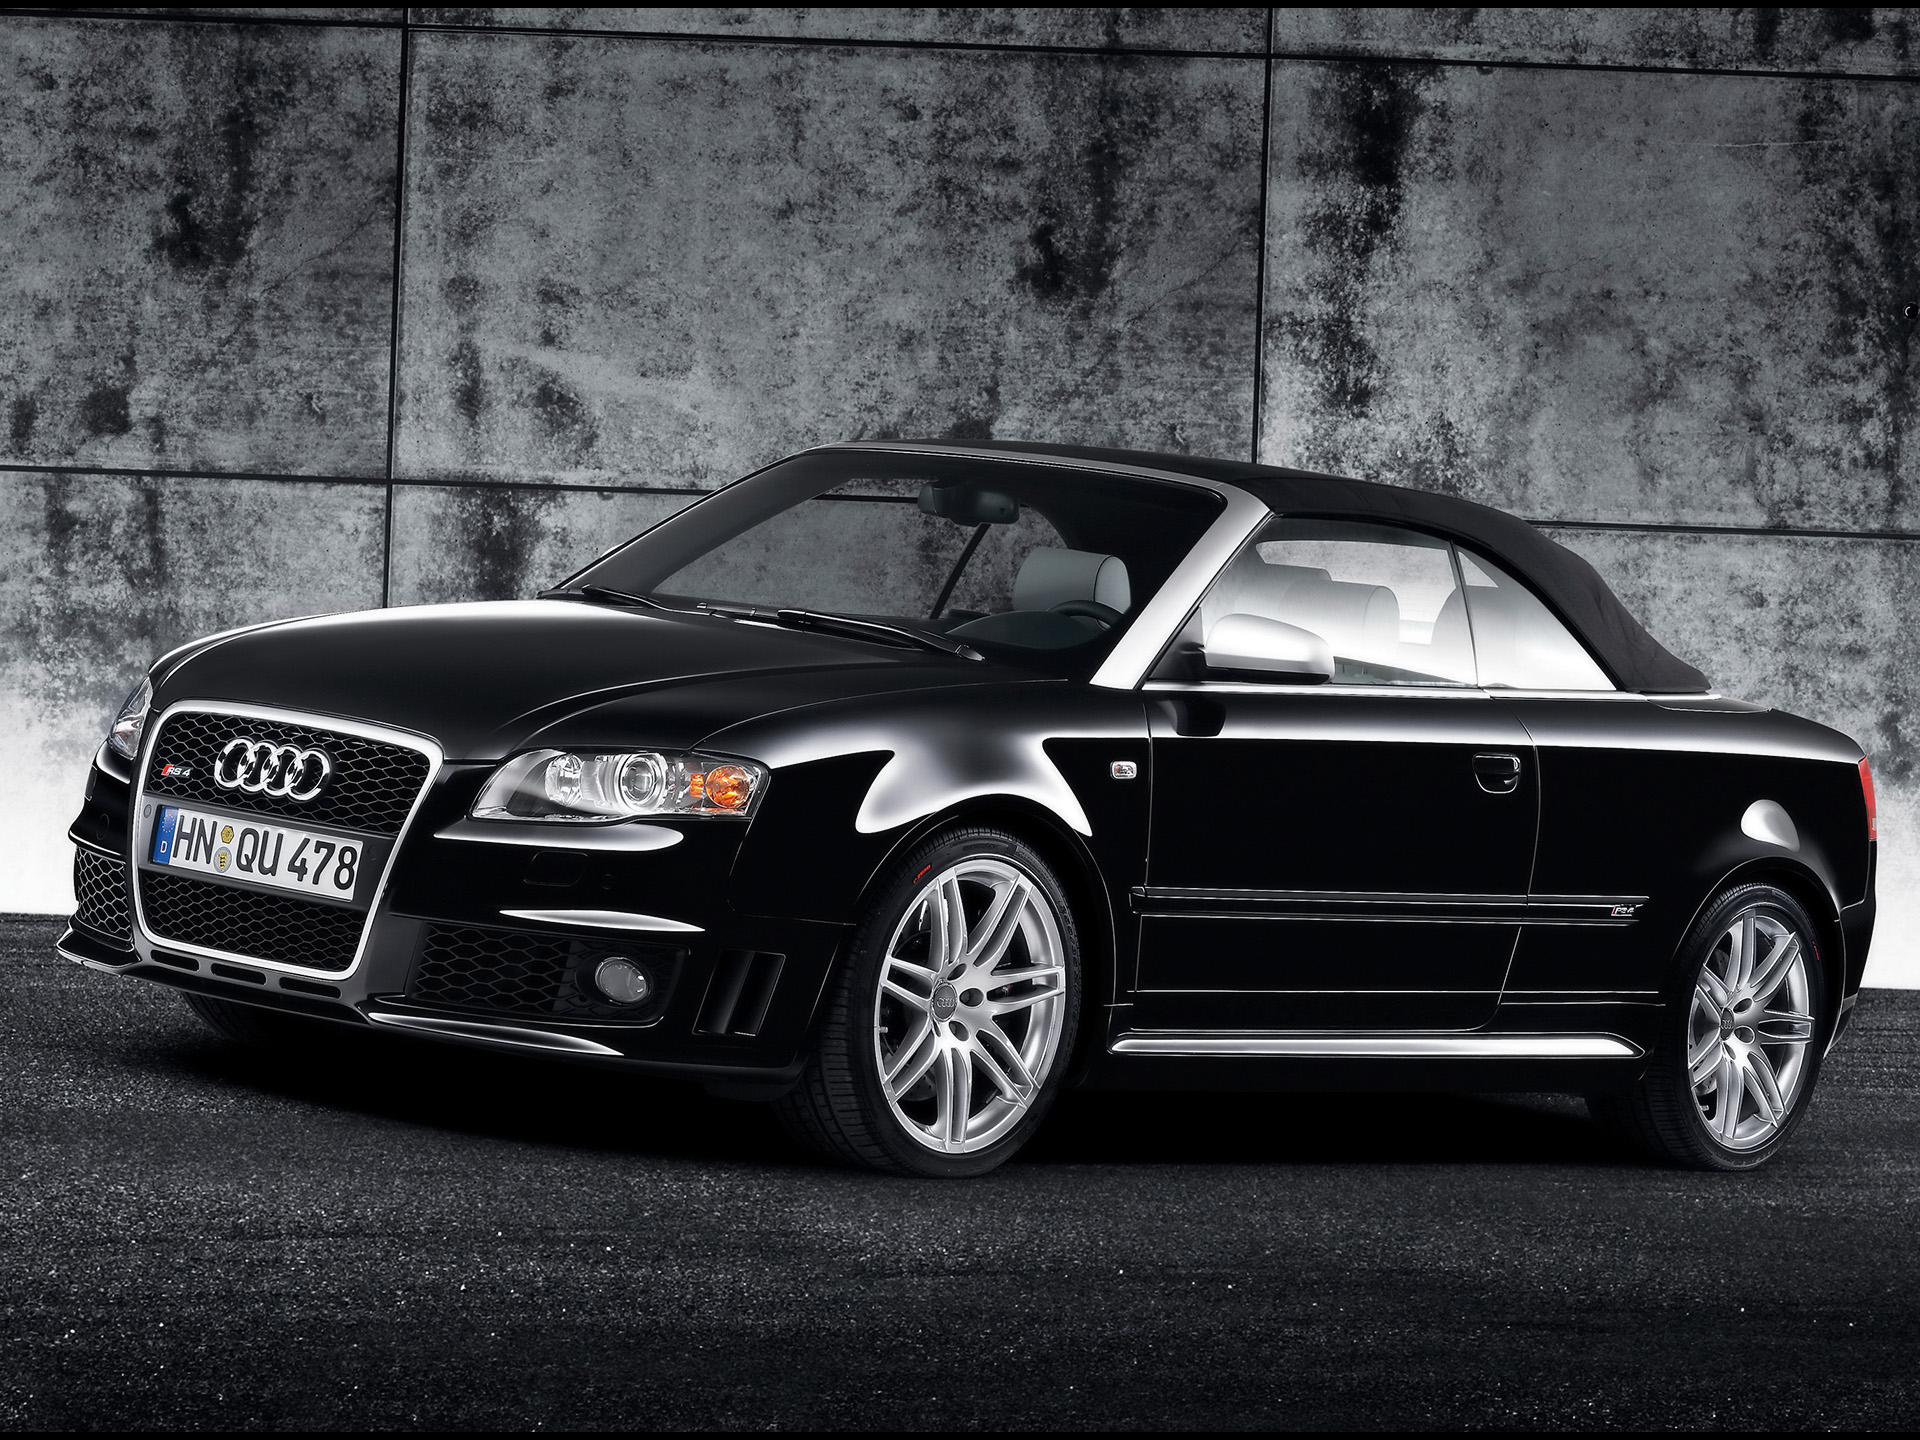 2008 Audi S4 News And Information Conceptcarz Com